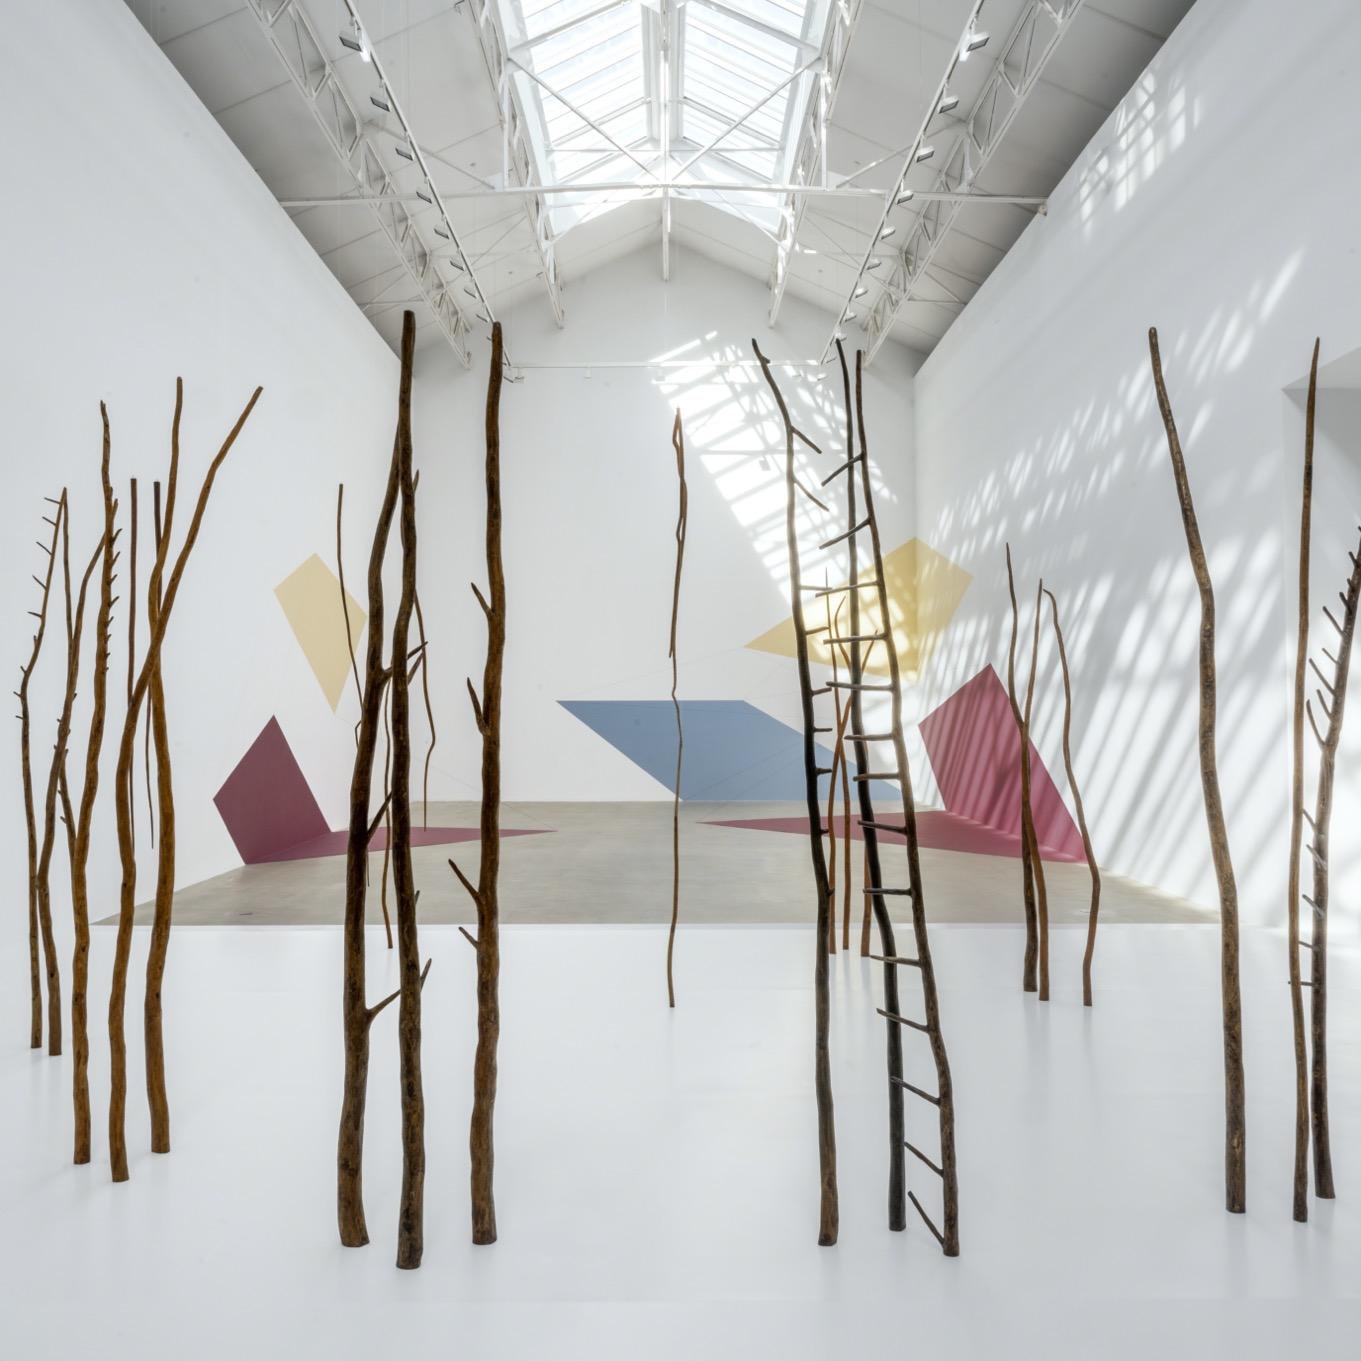 "Rosemarie Castoro, ""Forest of Threes"" (1977-1978) et Lydia Okumura, ""Untitled II"" et ""Untitled III"" (1981). Vue de l'exposition ""Dimensions of Reality : Female Minimal"" à la Galerie Thaddaeus Ropac, Pantin. Courtesy Galerie Thaddaeus Ropac, London · Paris · Salzburg © Lydia Okumura, Estate of Rosemarie Castoro. Photo: Charles Duprat"